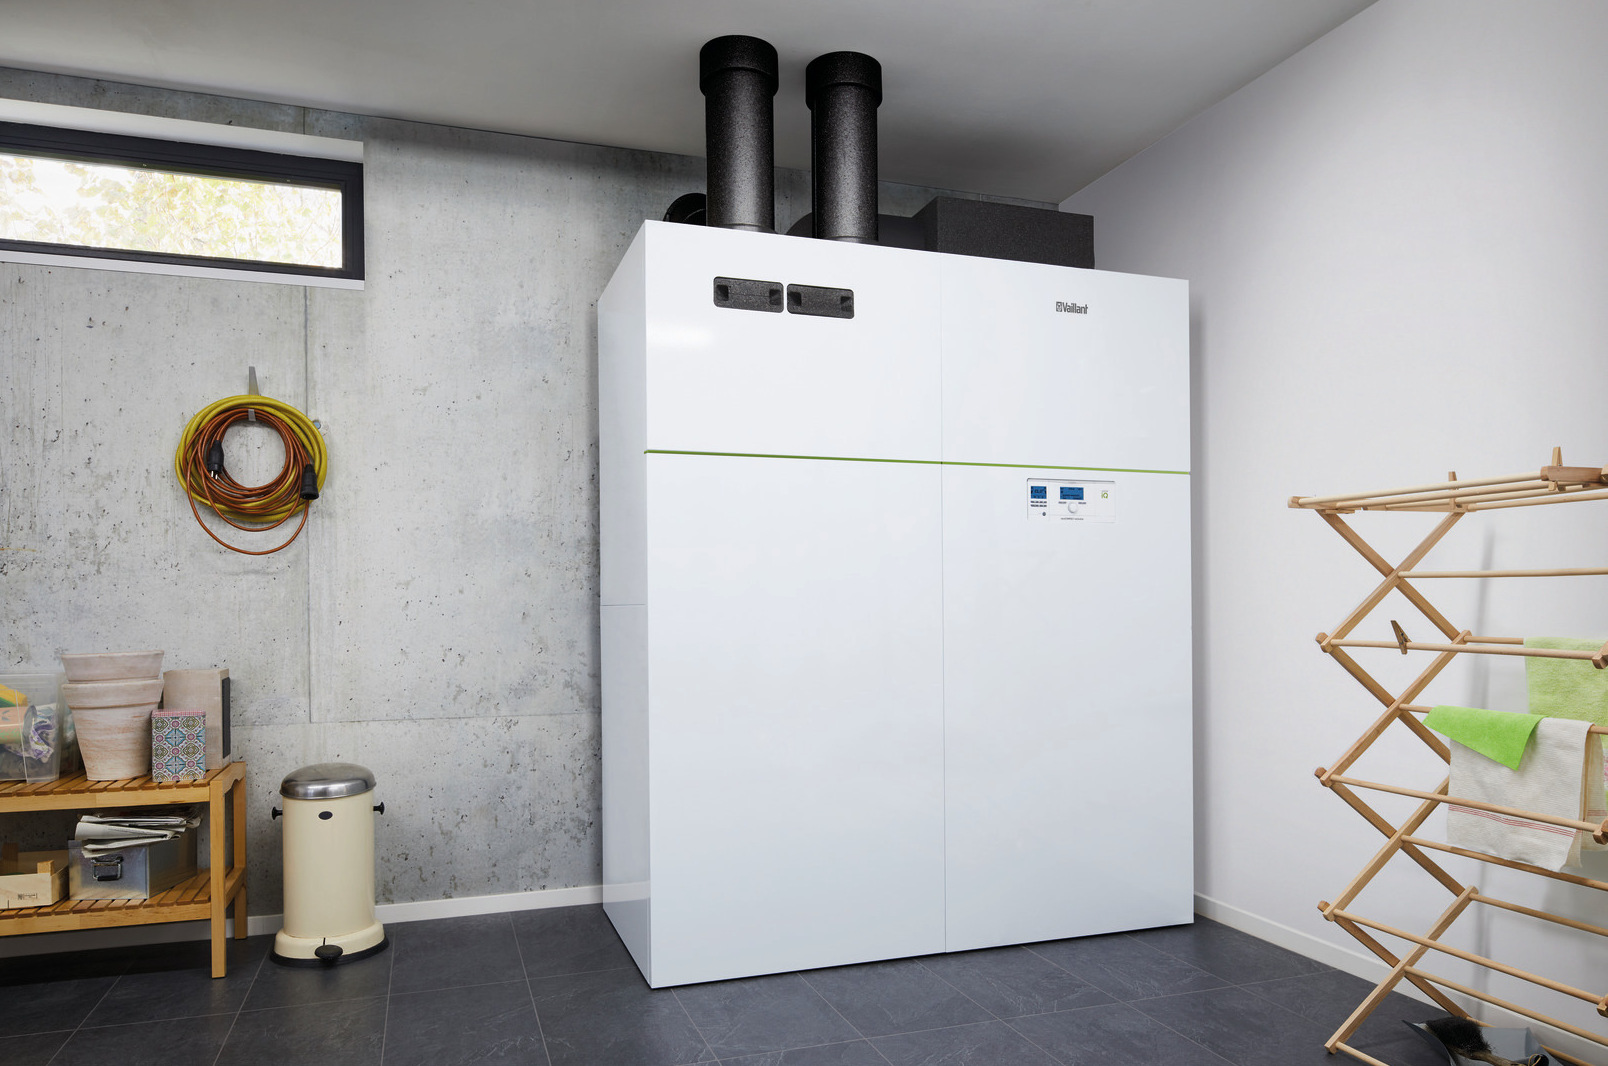 Vnútorné tepelné čerpadlo recoCOMPACT exclusive vzduch/voda s prieduchmi cez stenu + fotovoltika